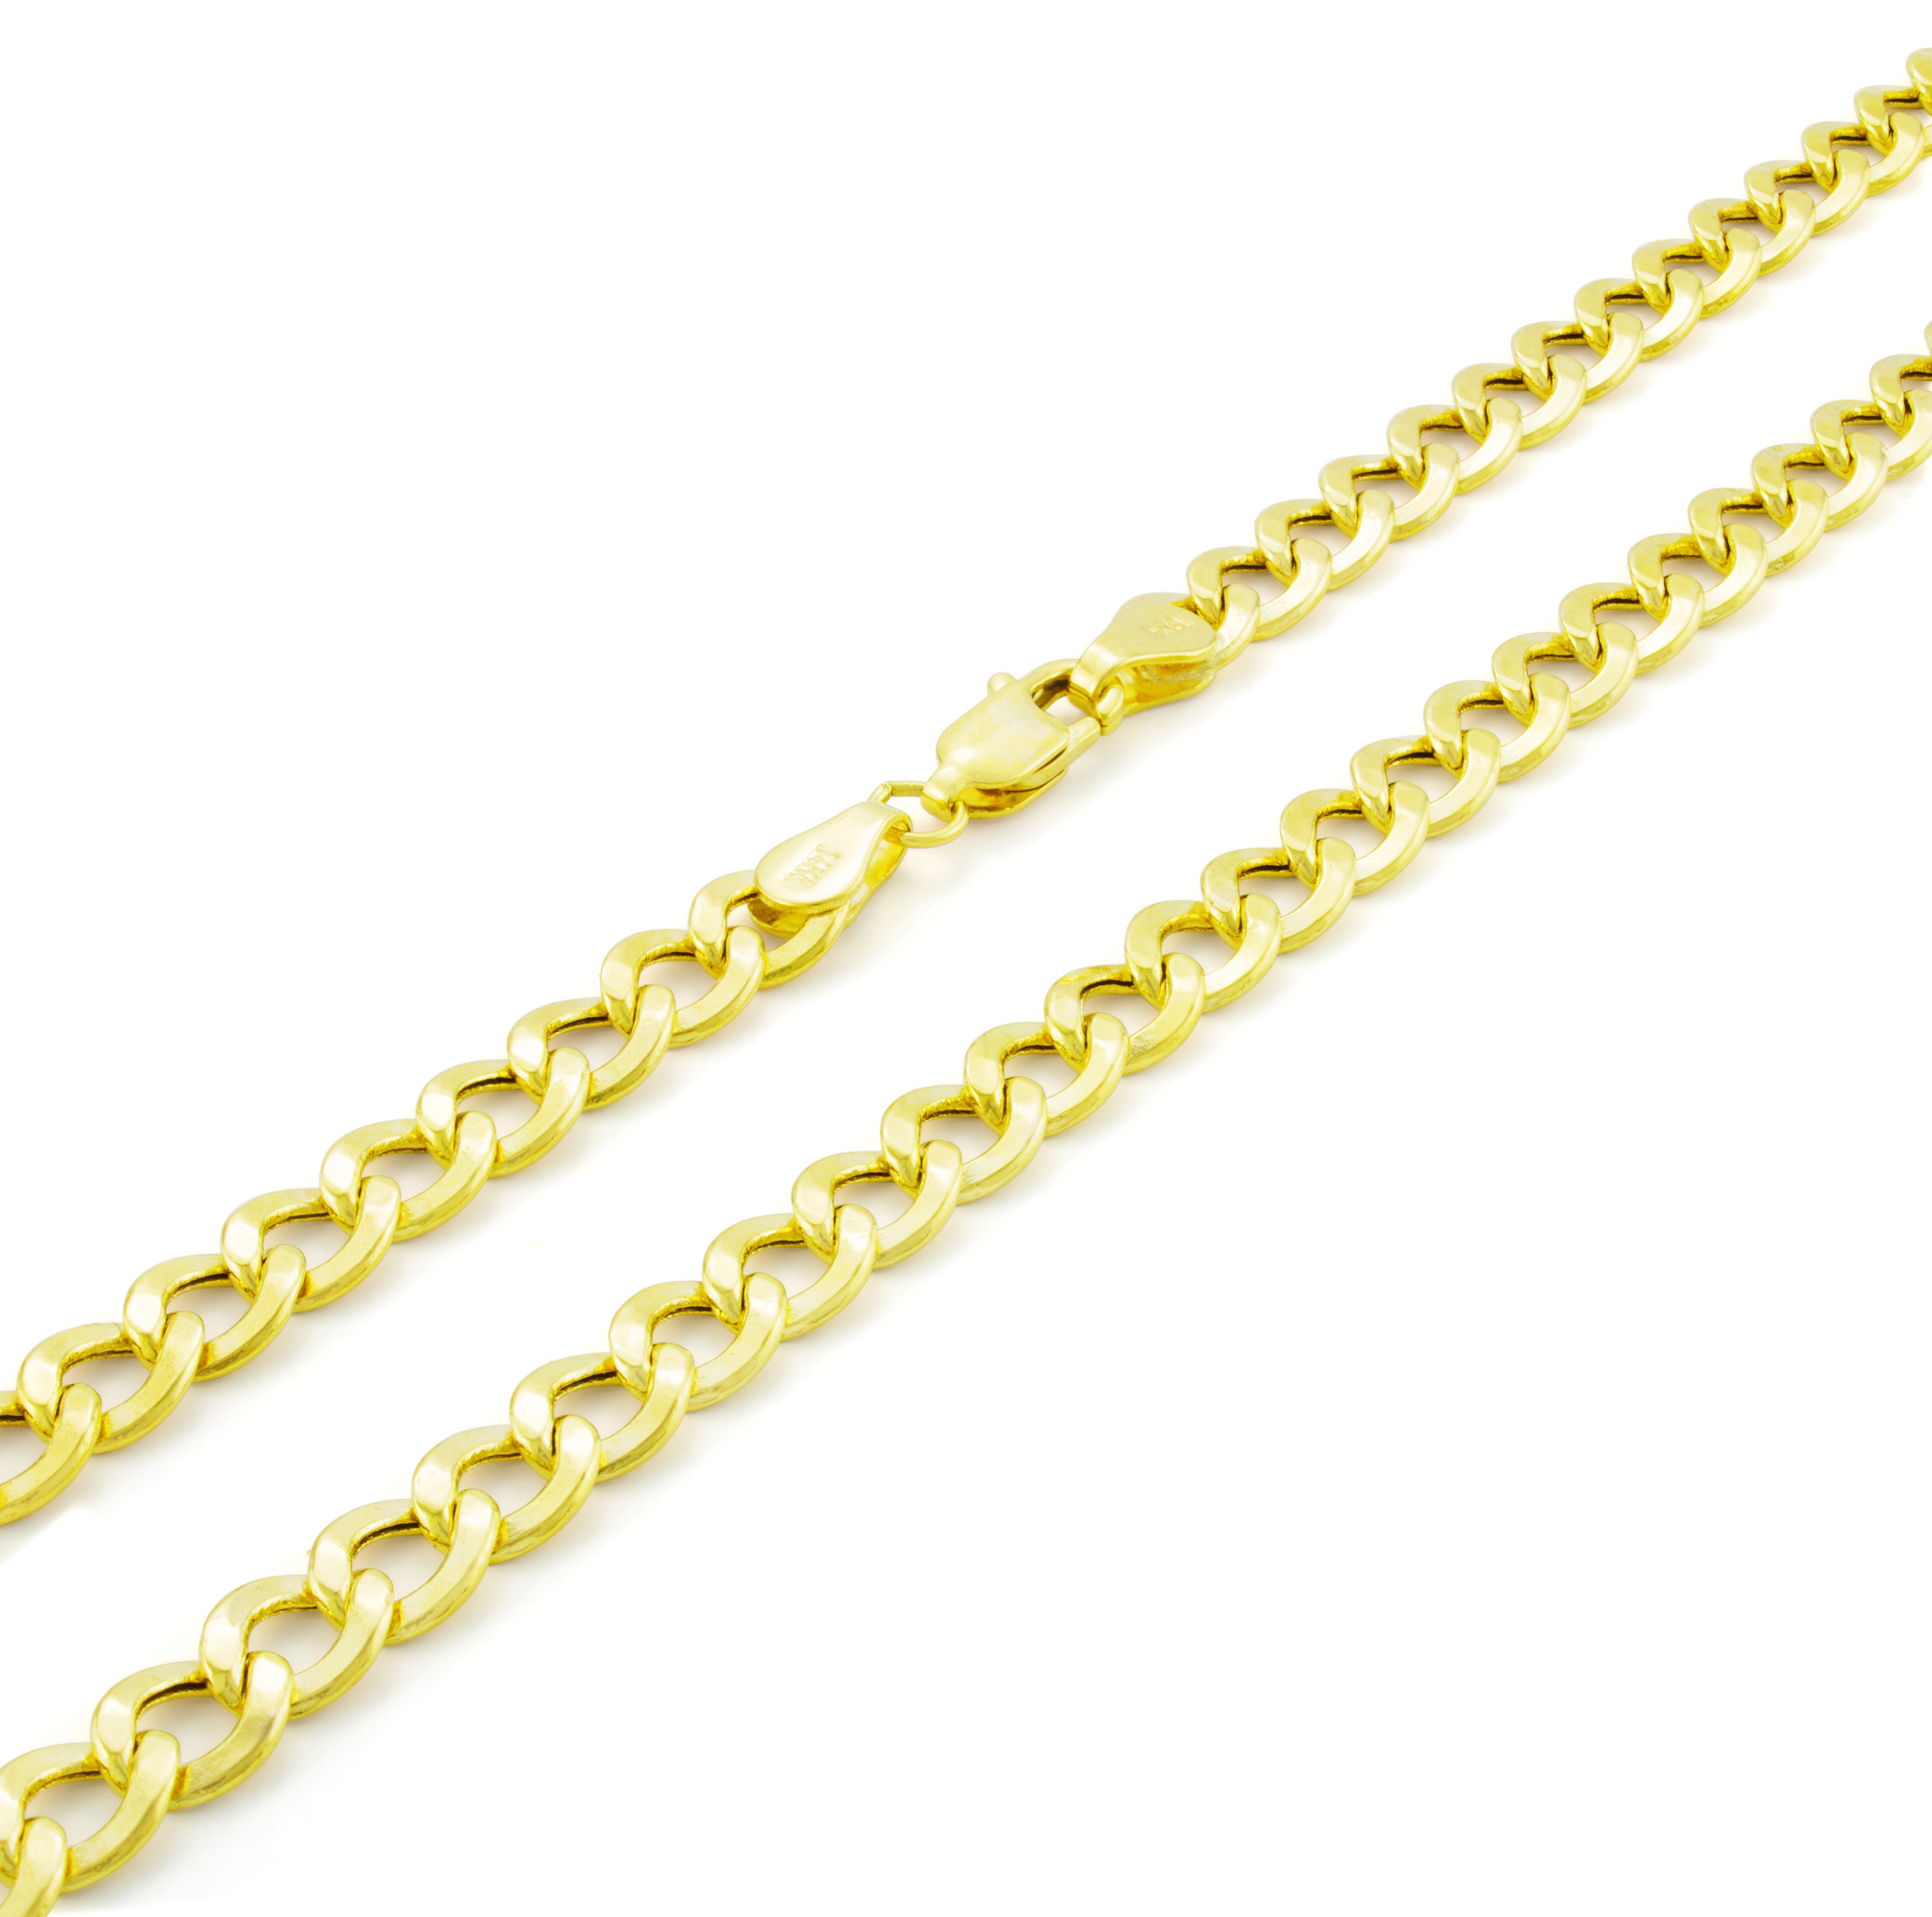 14K-Yellow-Gold-5-5mm-Italian-Curb-Cuban-Link-Chain-Bracelet-Mens-Women-7-034-8-034-9-034 thumbnail 16